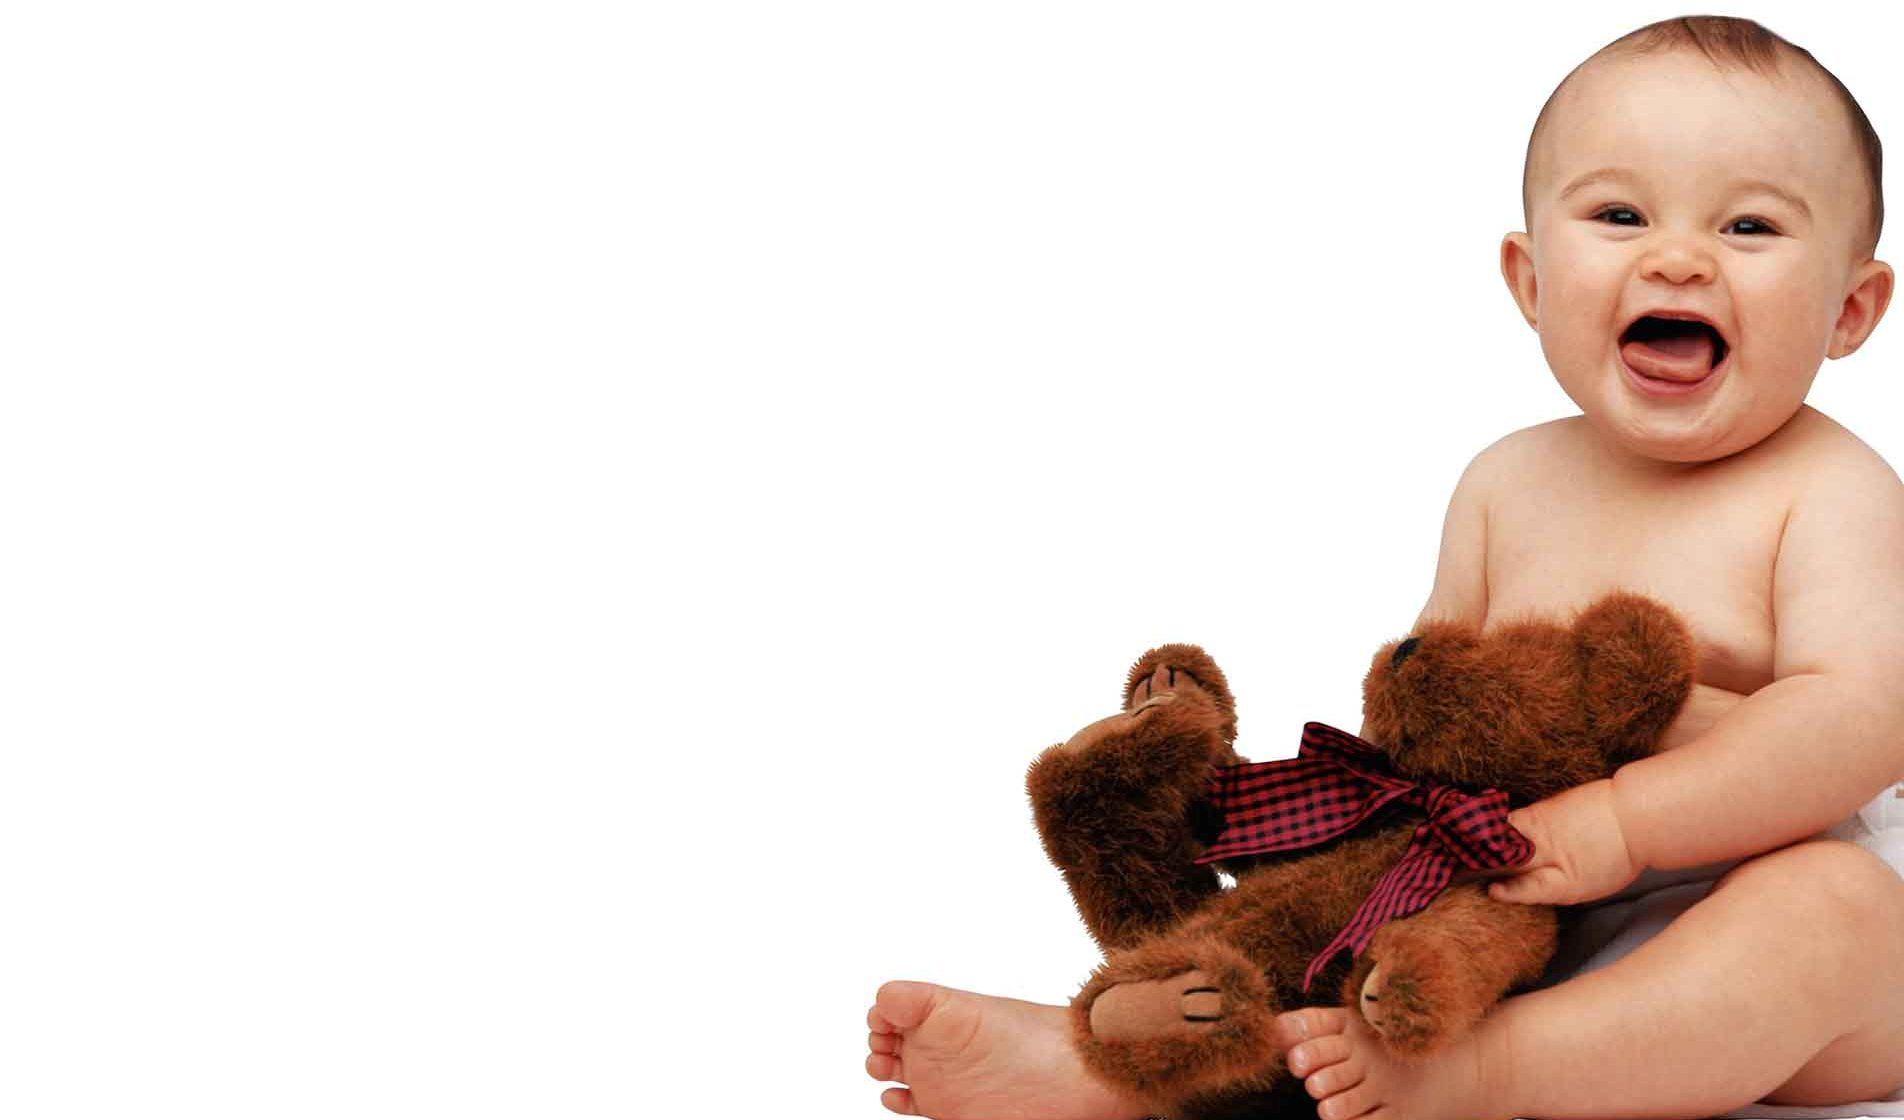 menghemat perawatan bayi